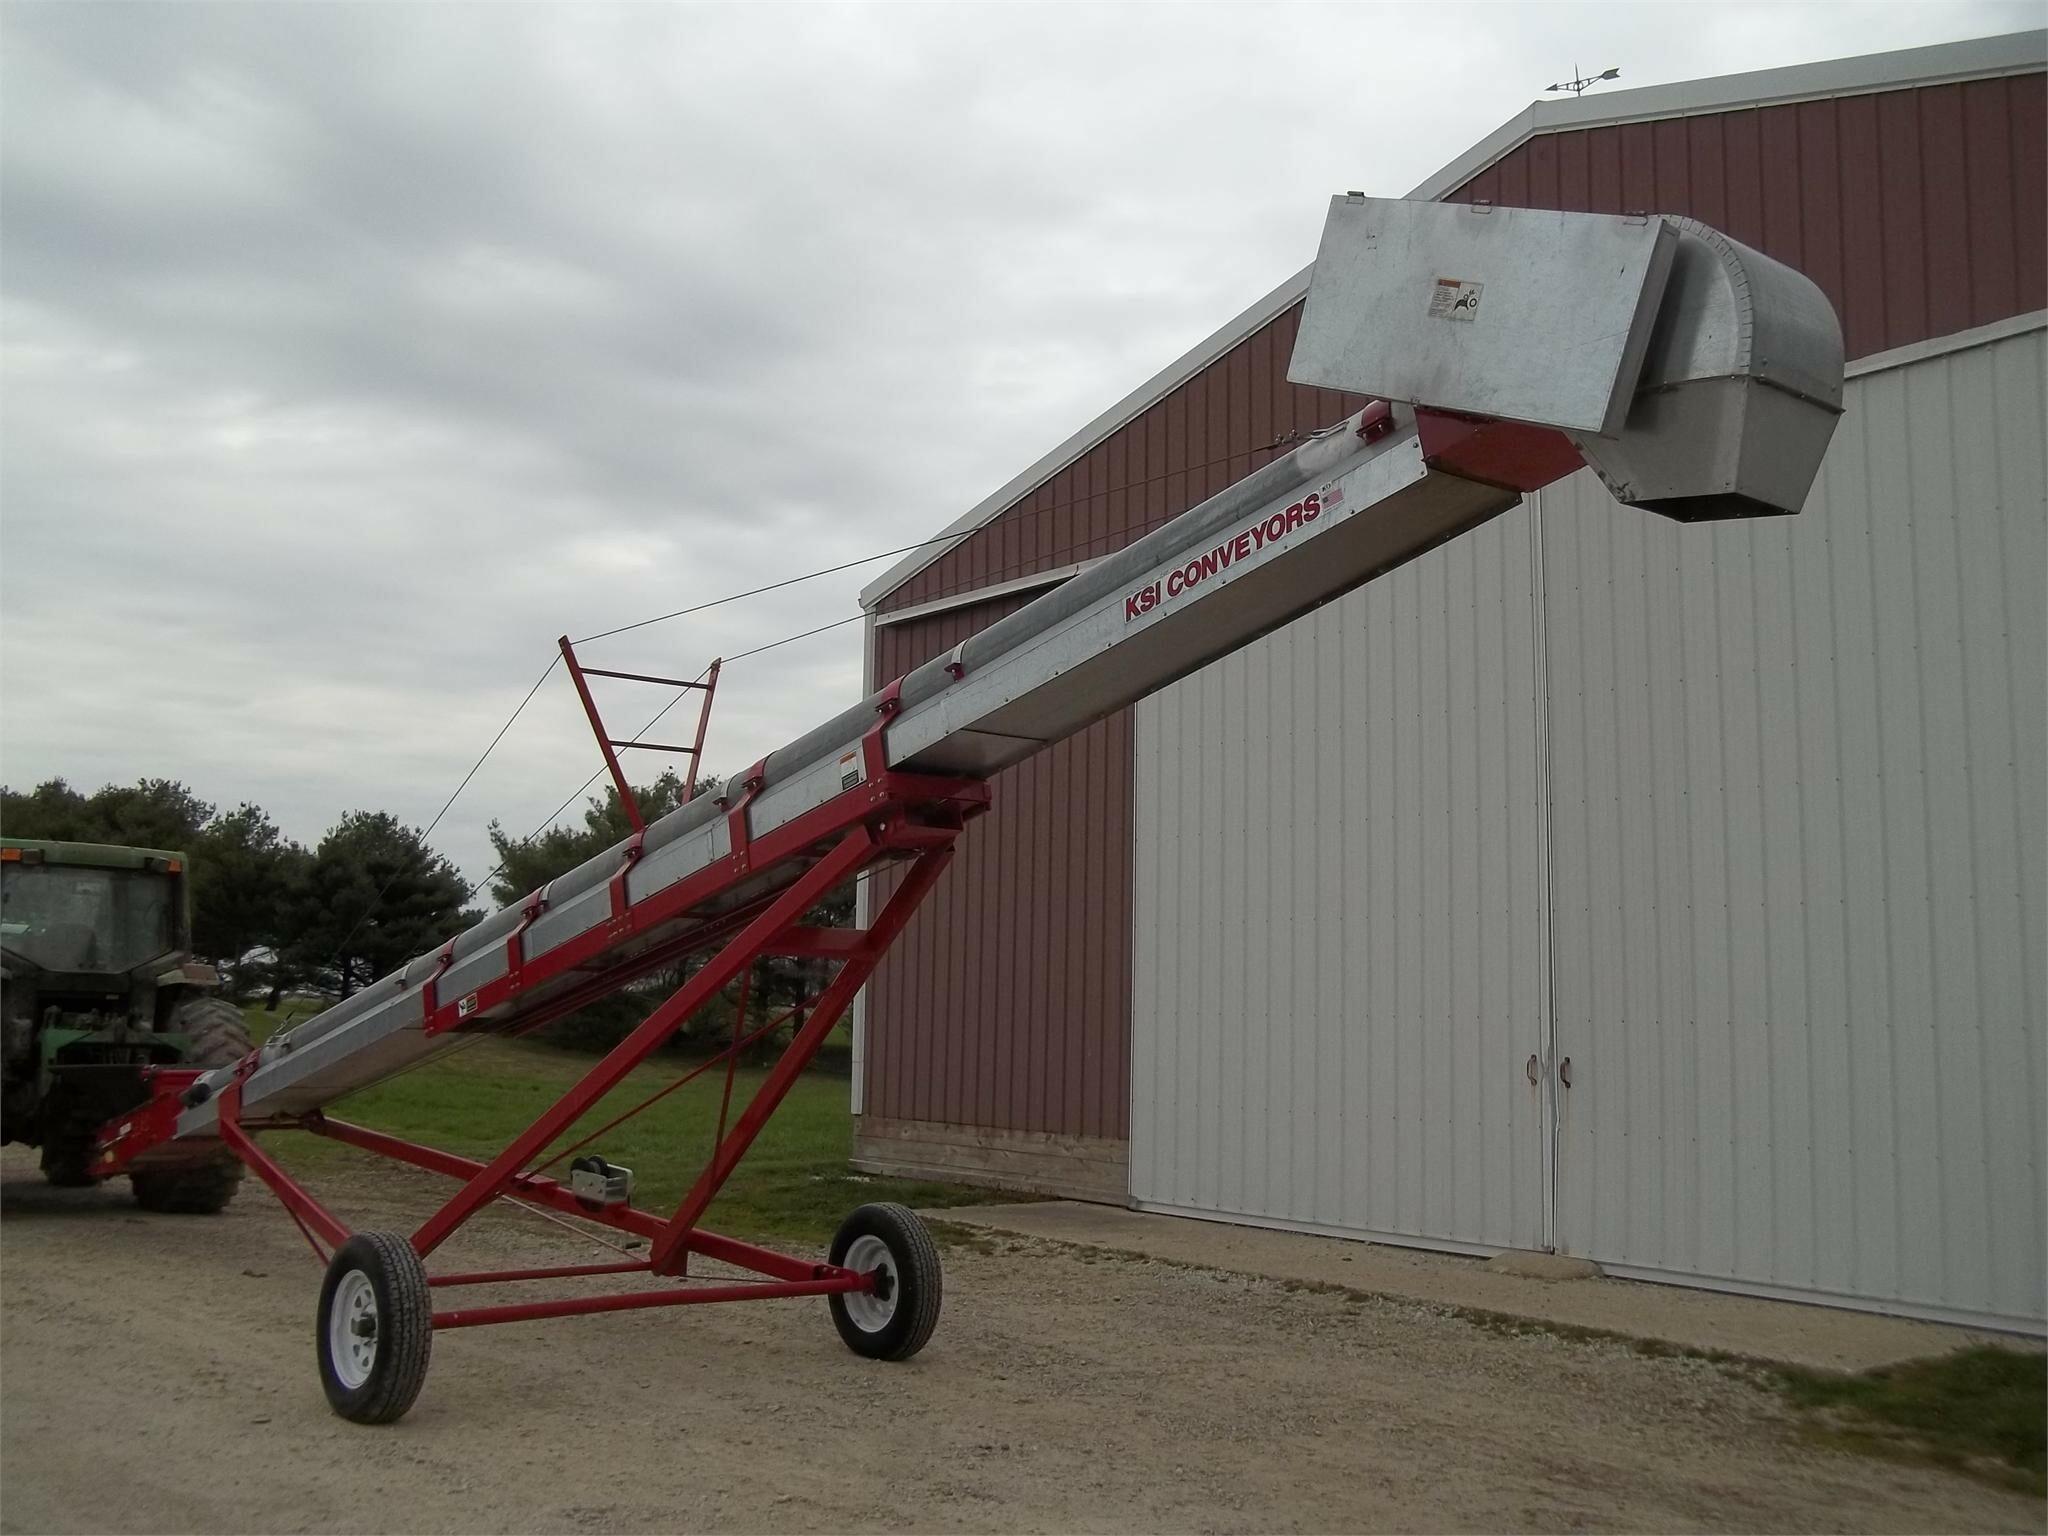 KSI 161037 Augers and Conveyor